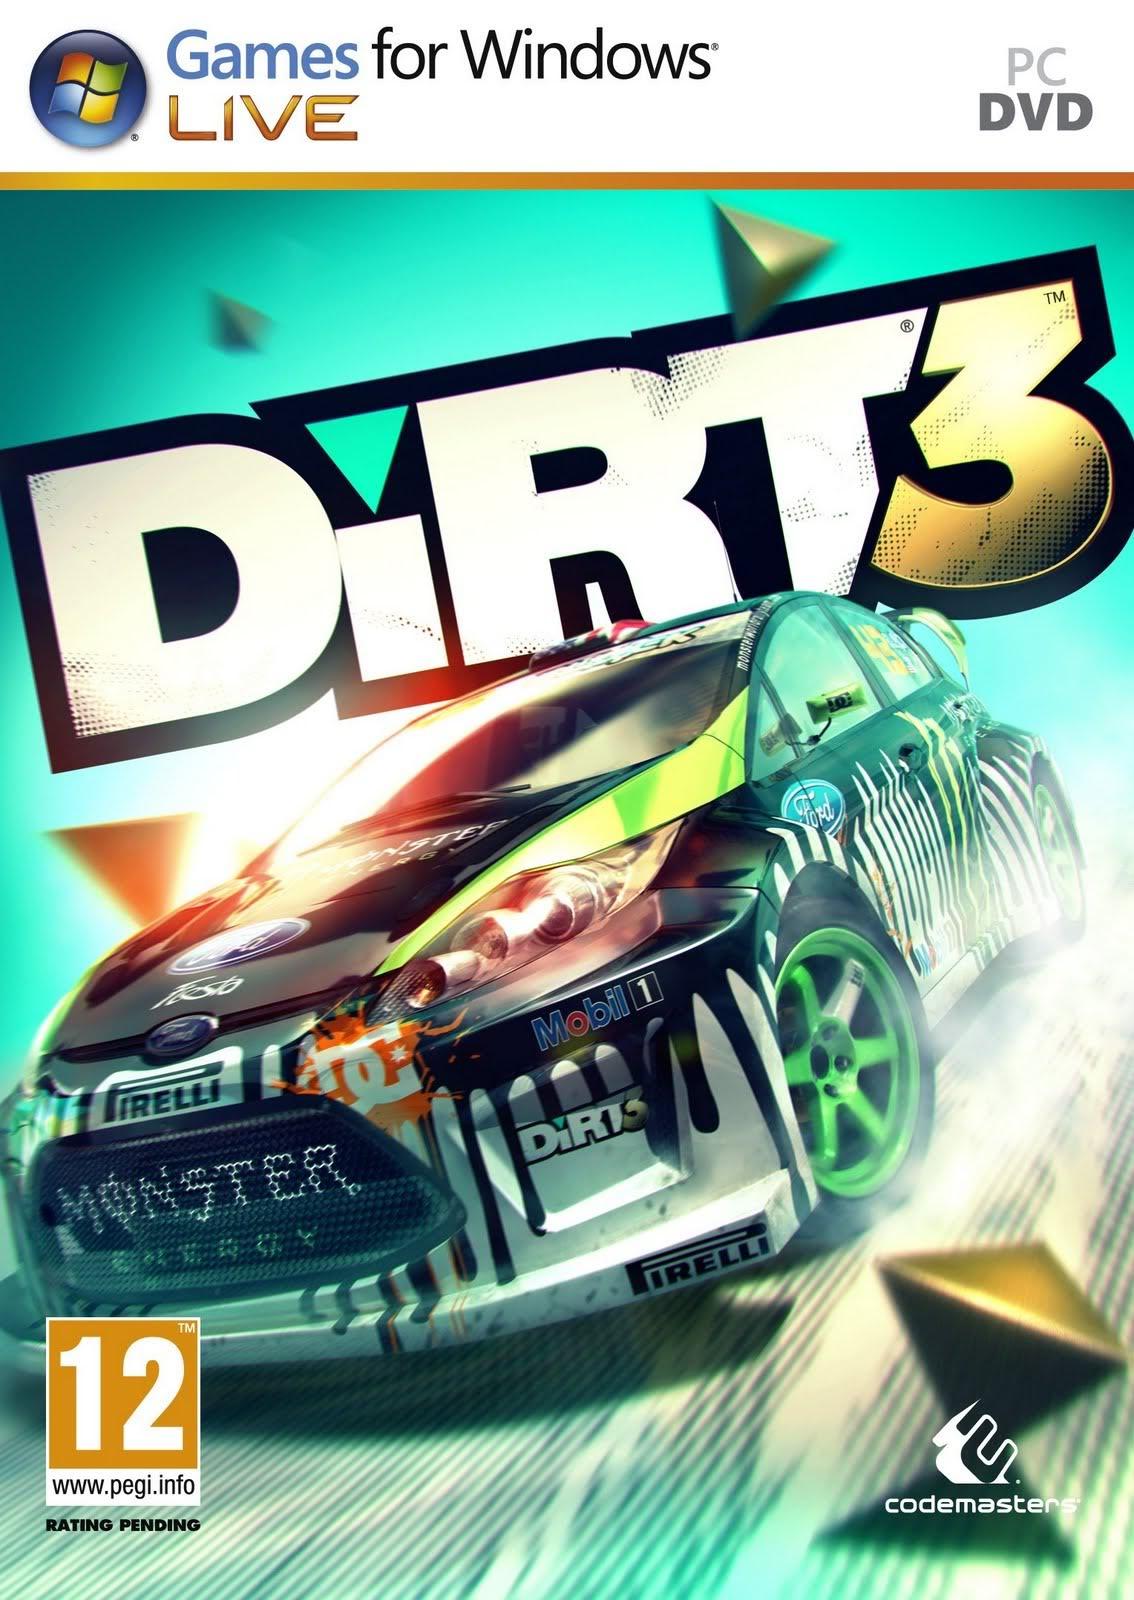 [PC/Games] Dirt3 - เกมส์ขับรถที่ได้รับความนิยมอย่างมากมายในตอนนี้  [Full-Repack/Howto/SS/Multi][3.8G... D3cover1